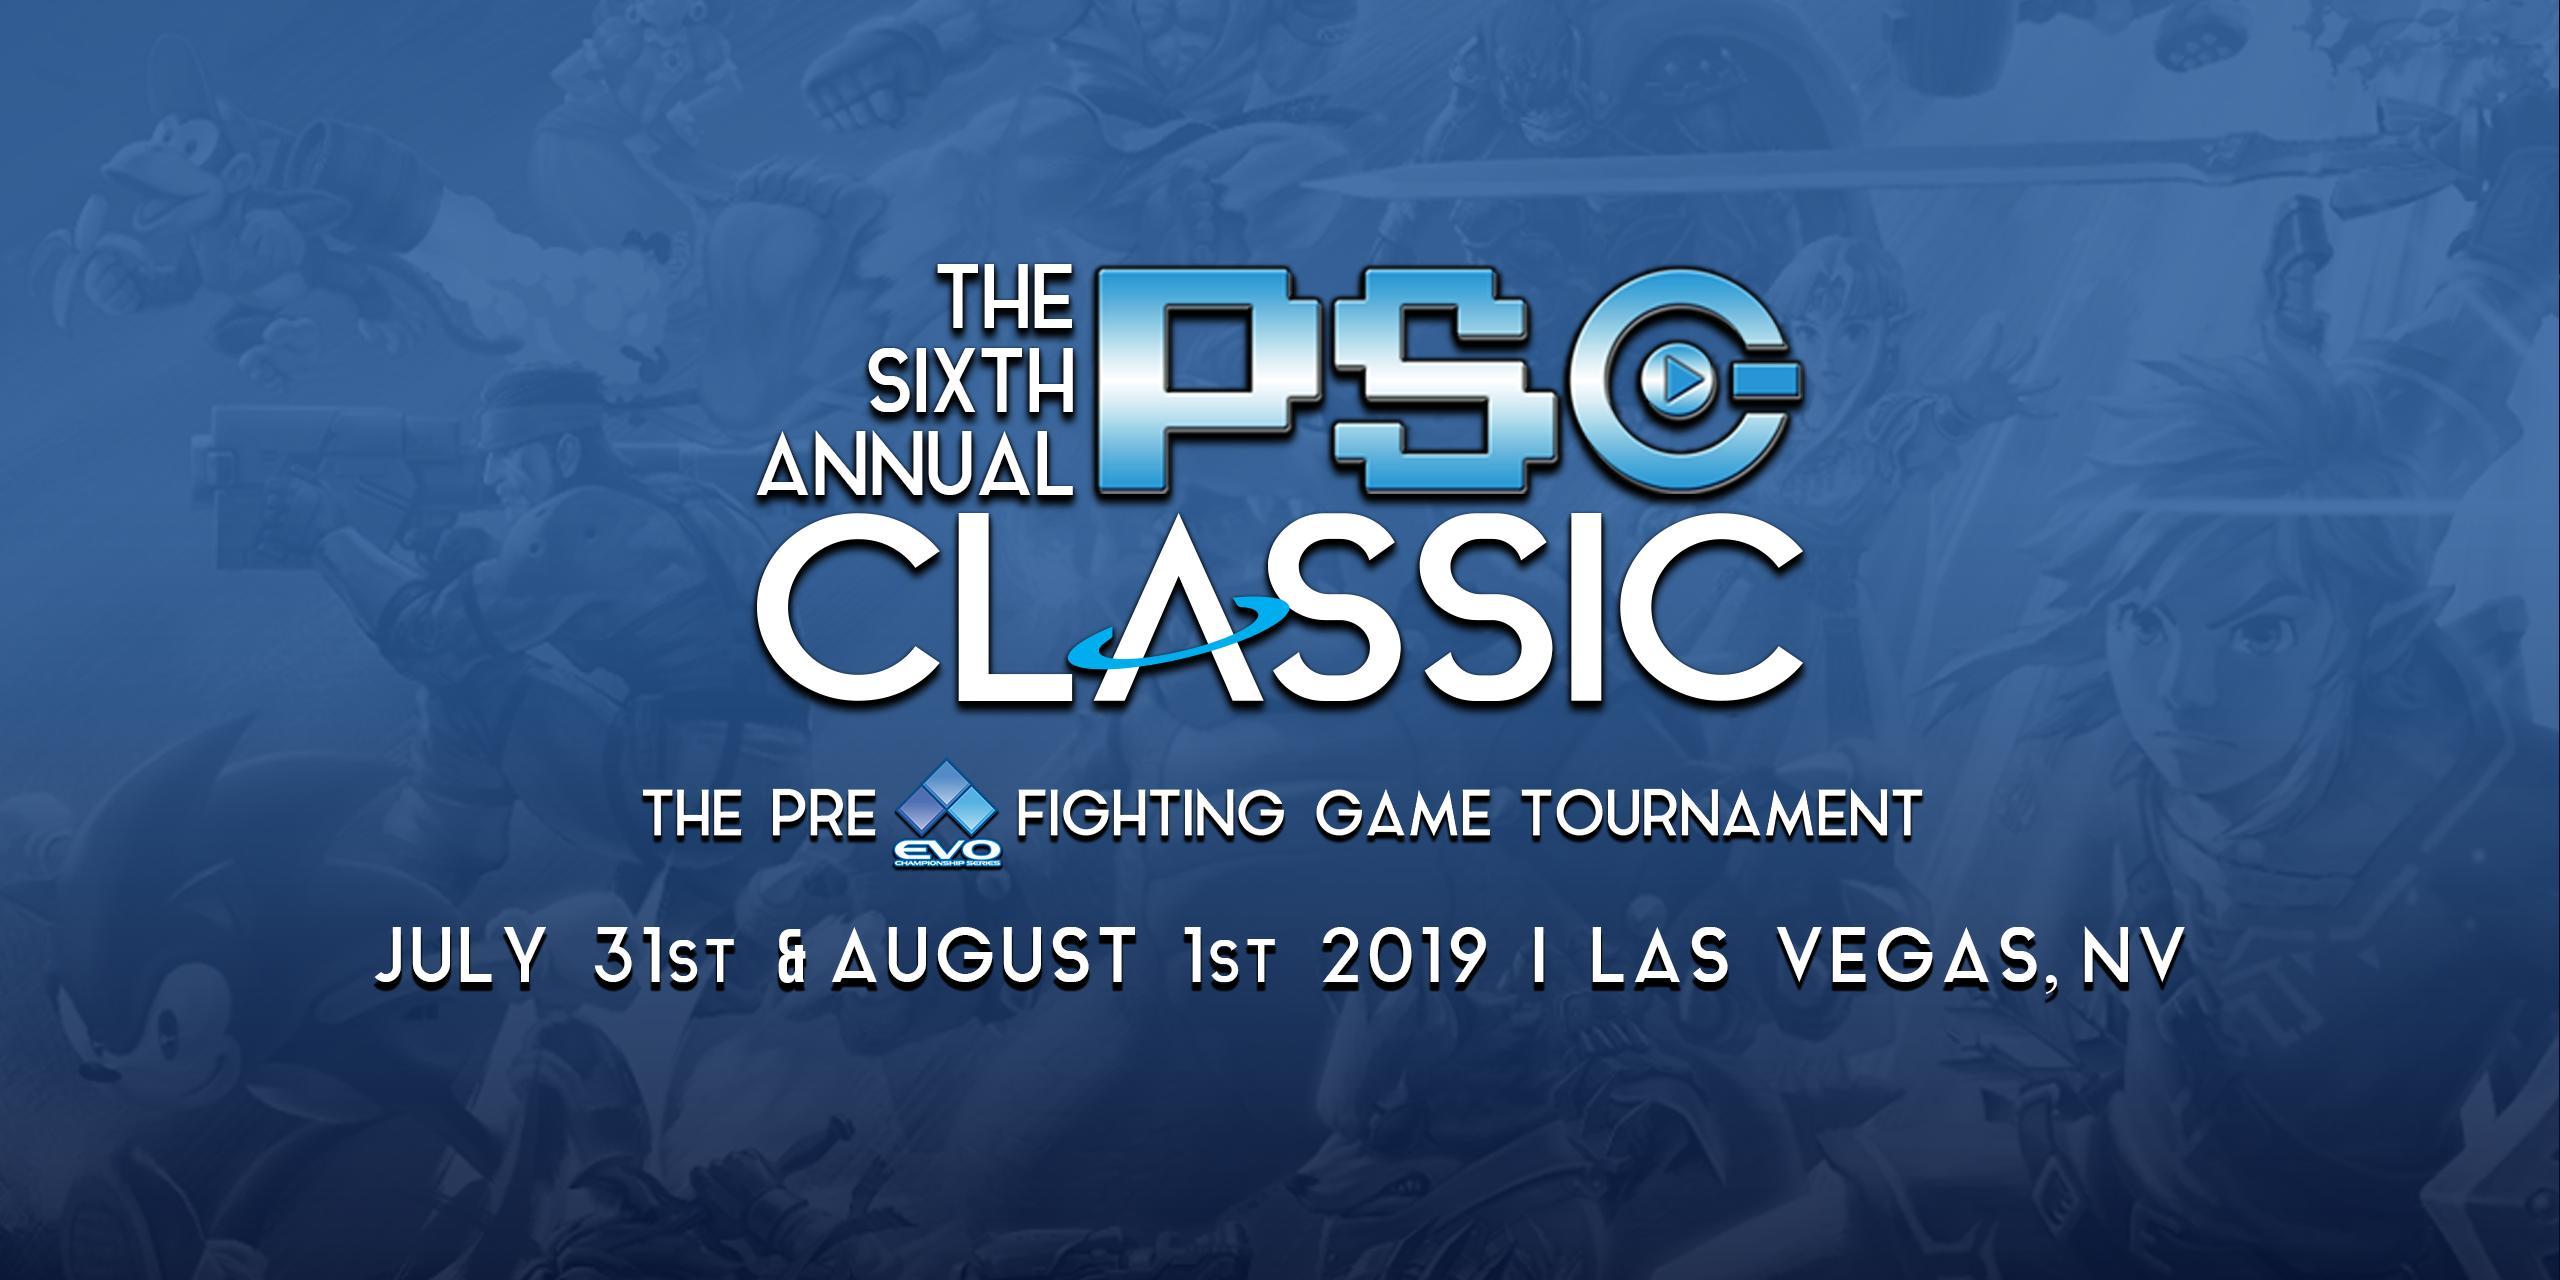 6th Annual PSG Classic | Esports in Las Vegas